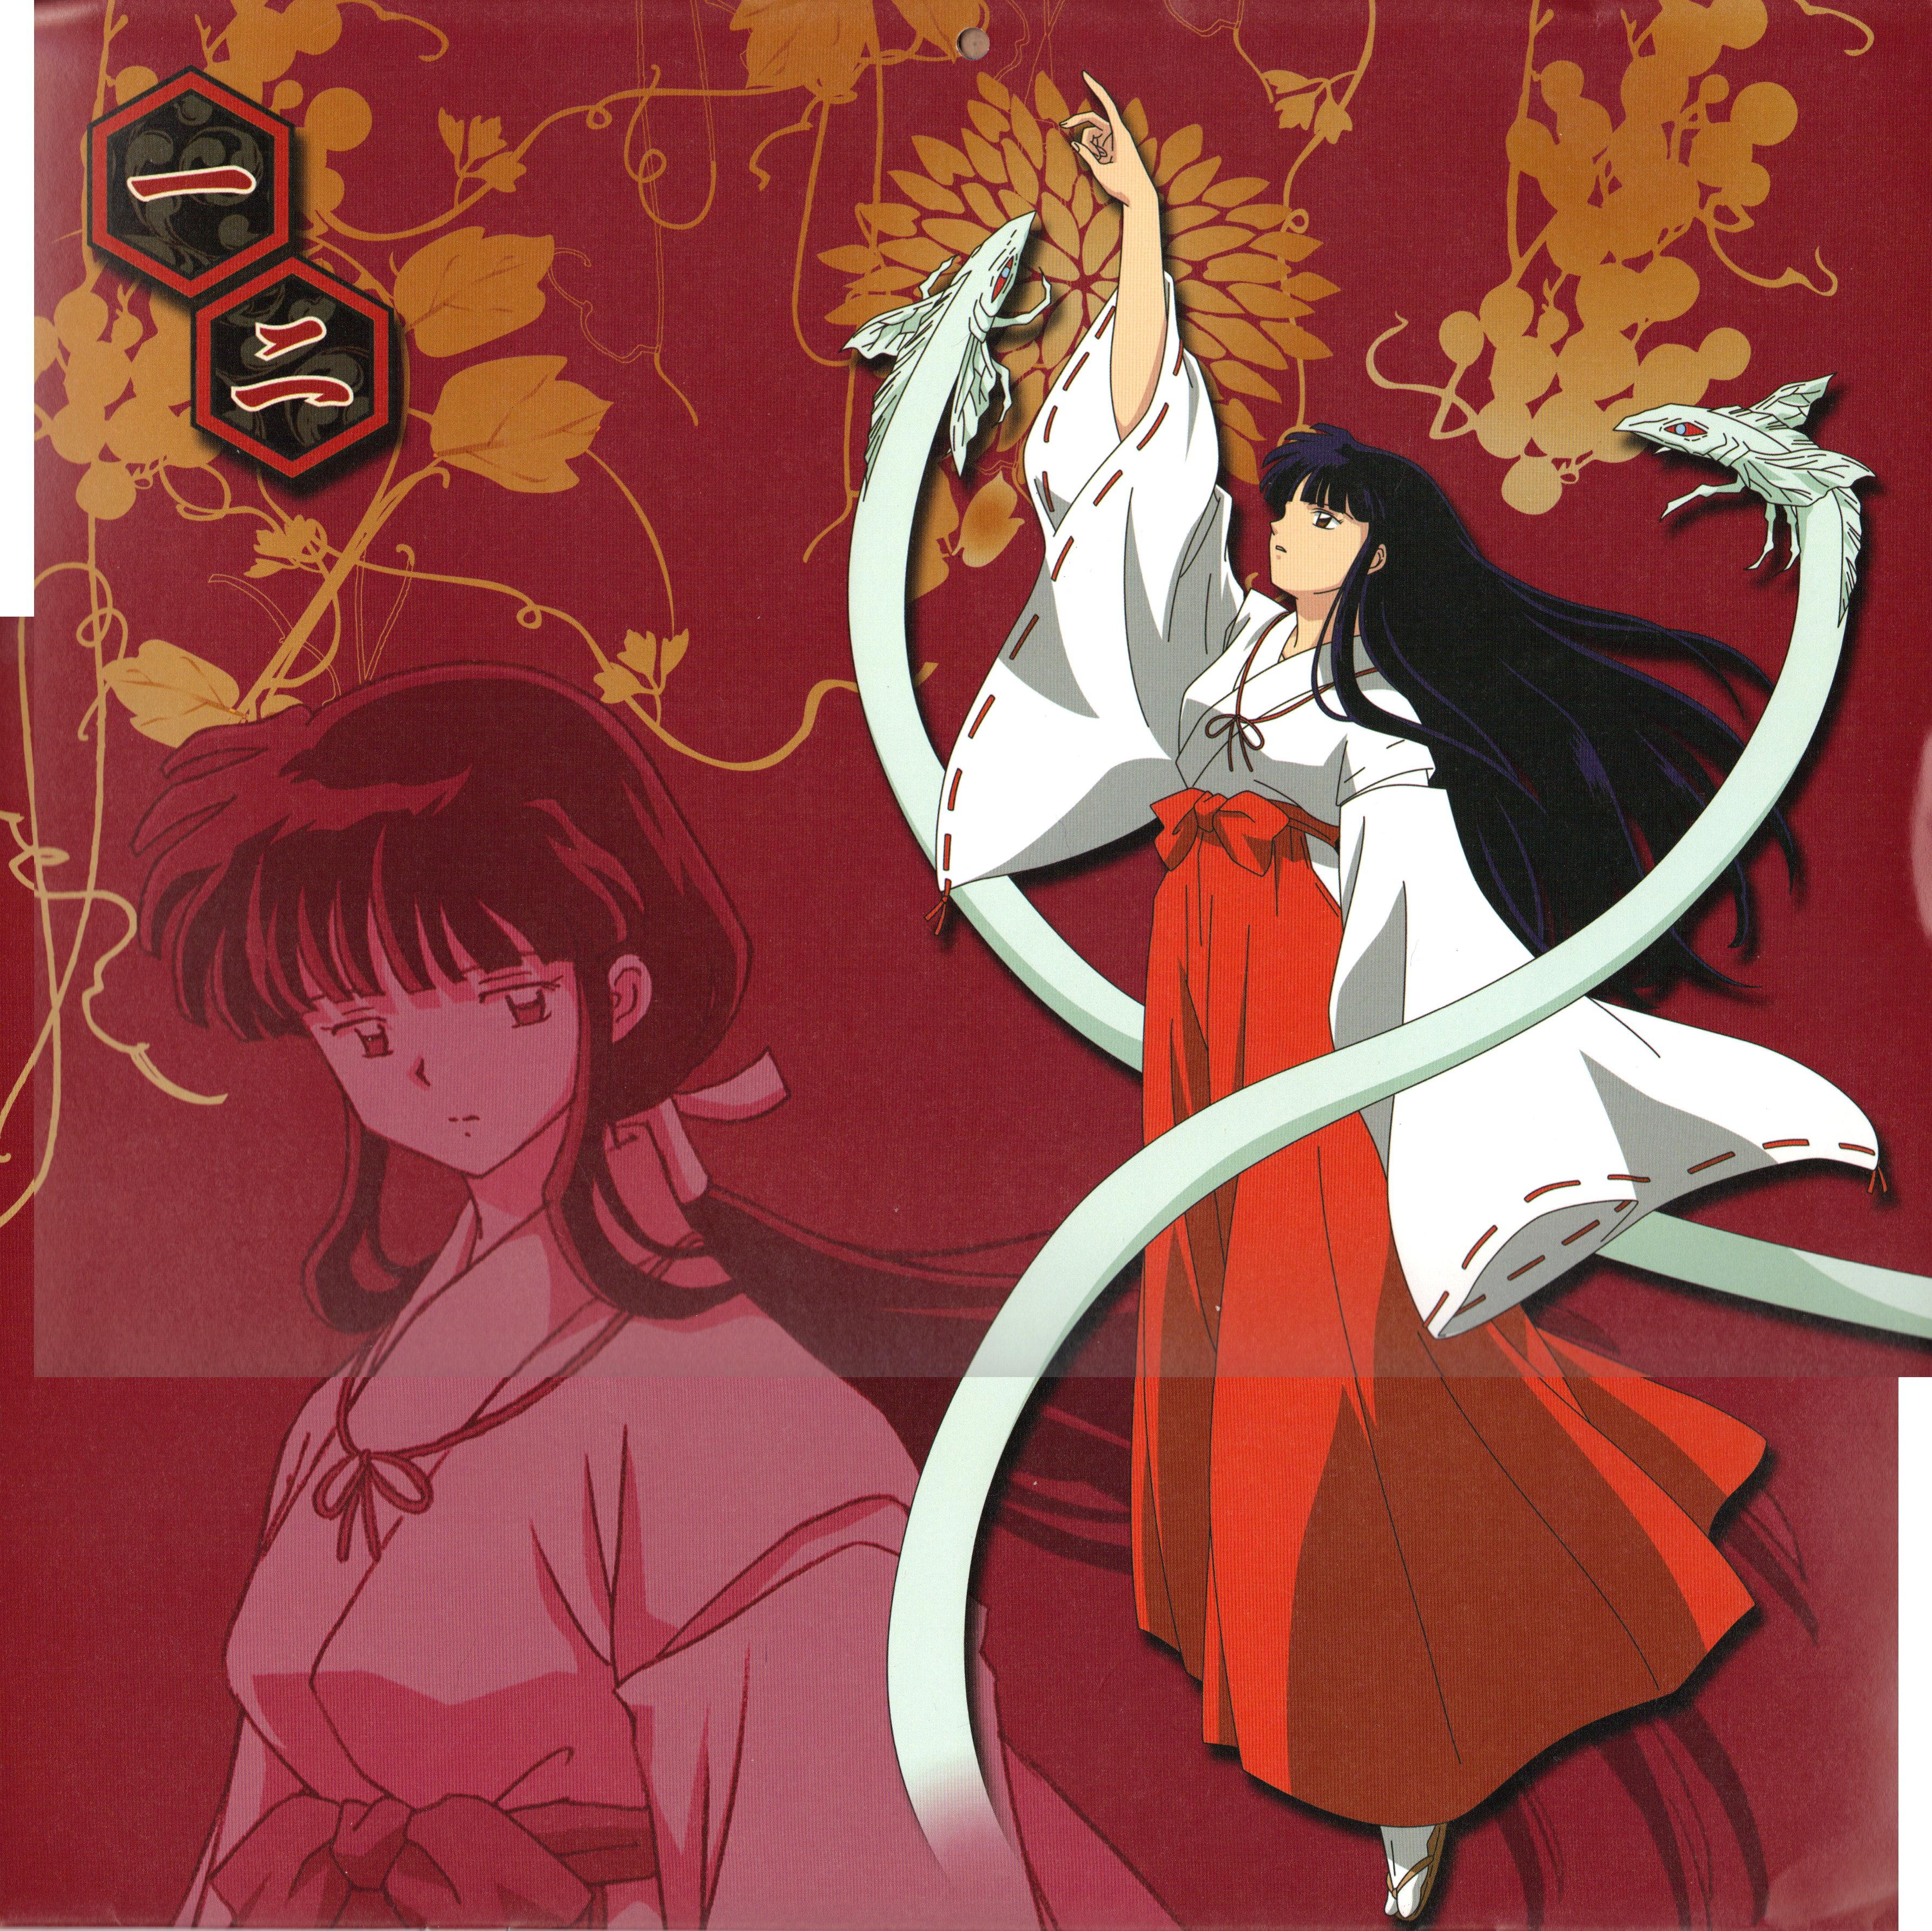 7700 Koleksi Gambar Kartun Romantis Inuyasha Terbaru